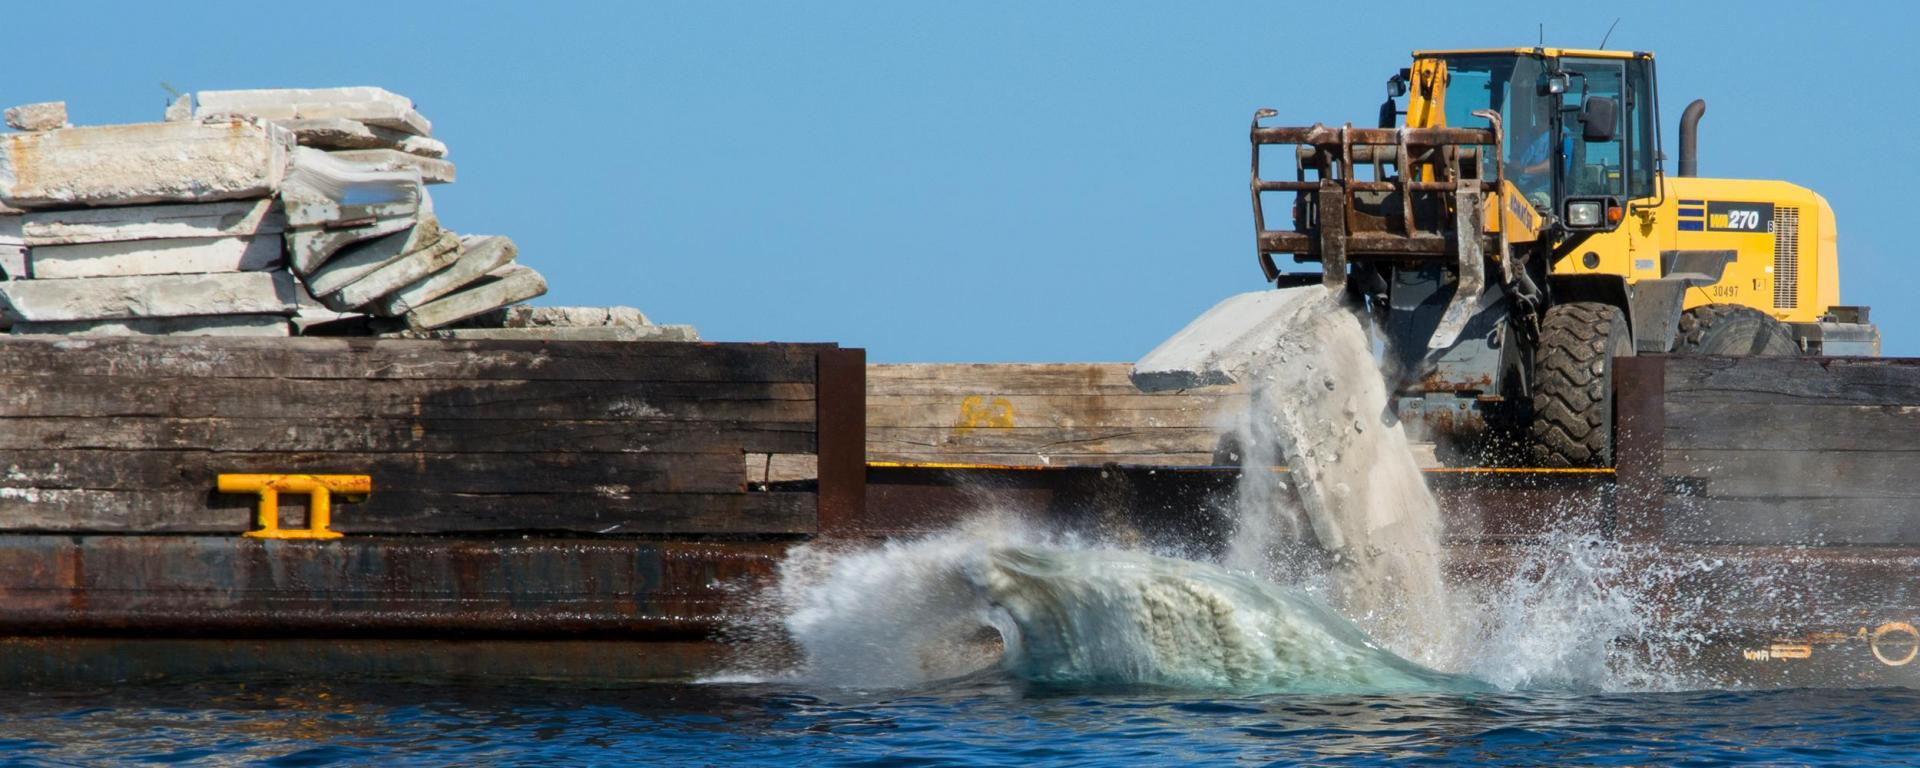 Artificial Reef Deployment